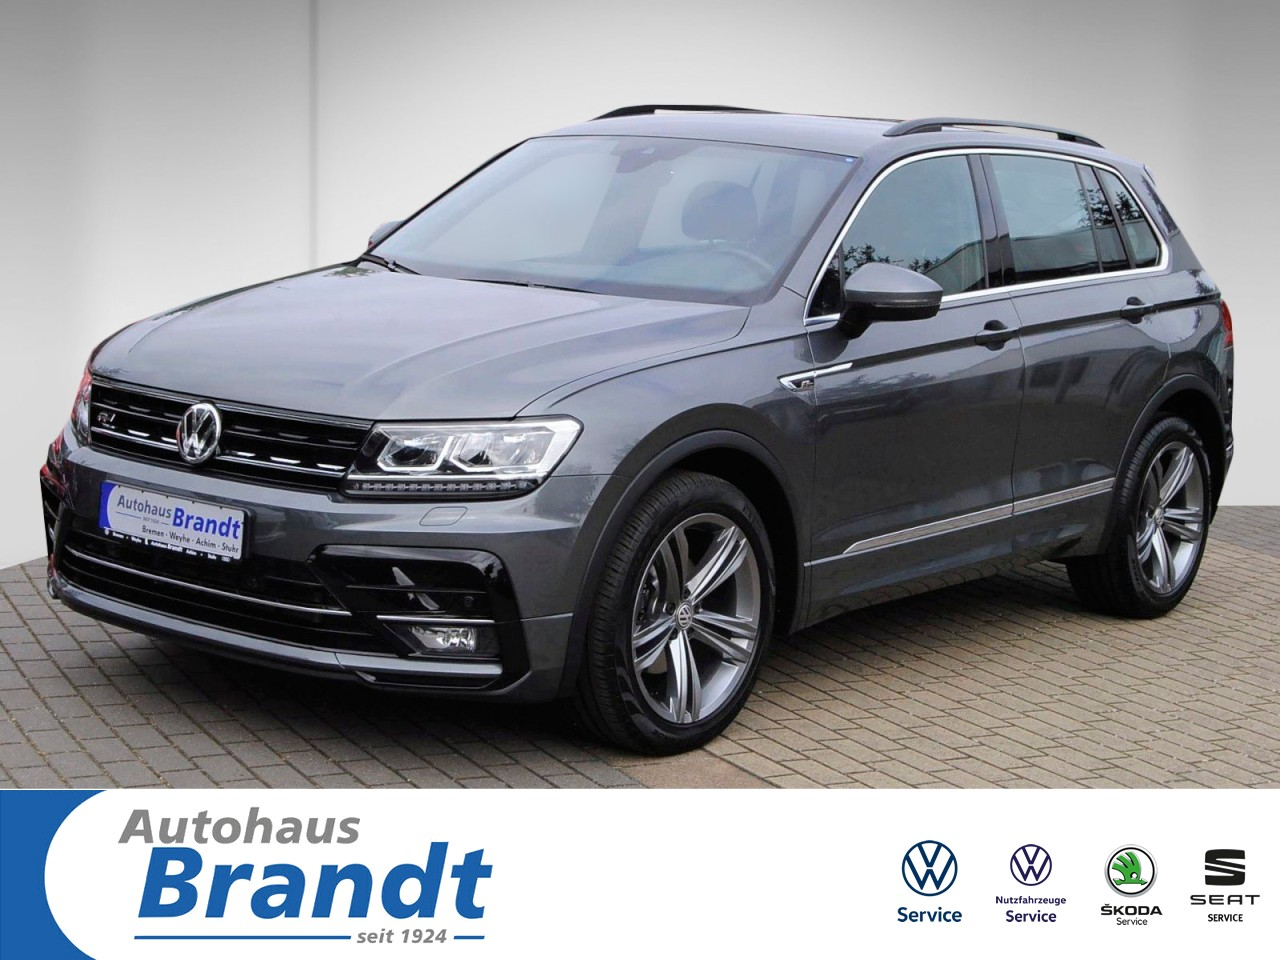 Volkswagen Tiguan 2.0 TDI Comfortline R-LINE*DSG*LED*ACTIVE INFO*ACC, Jahr 2018, Diesel